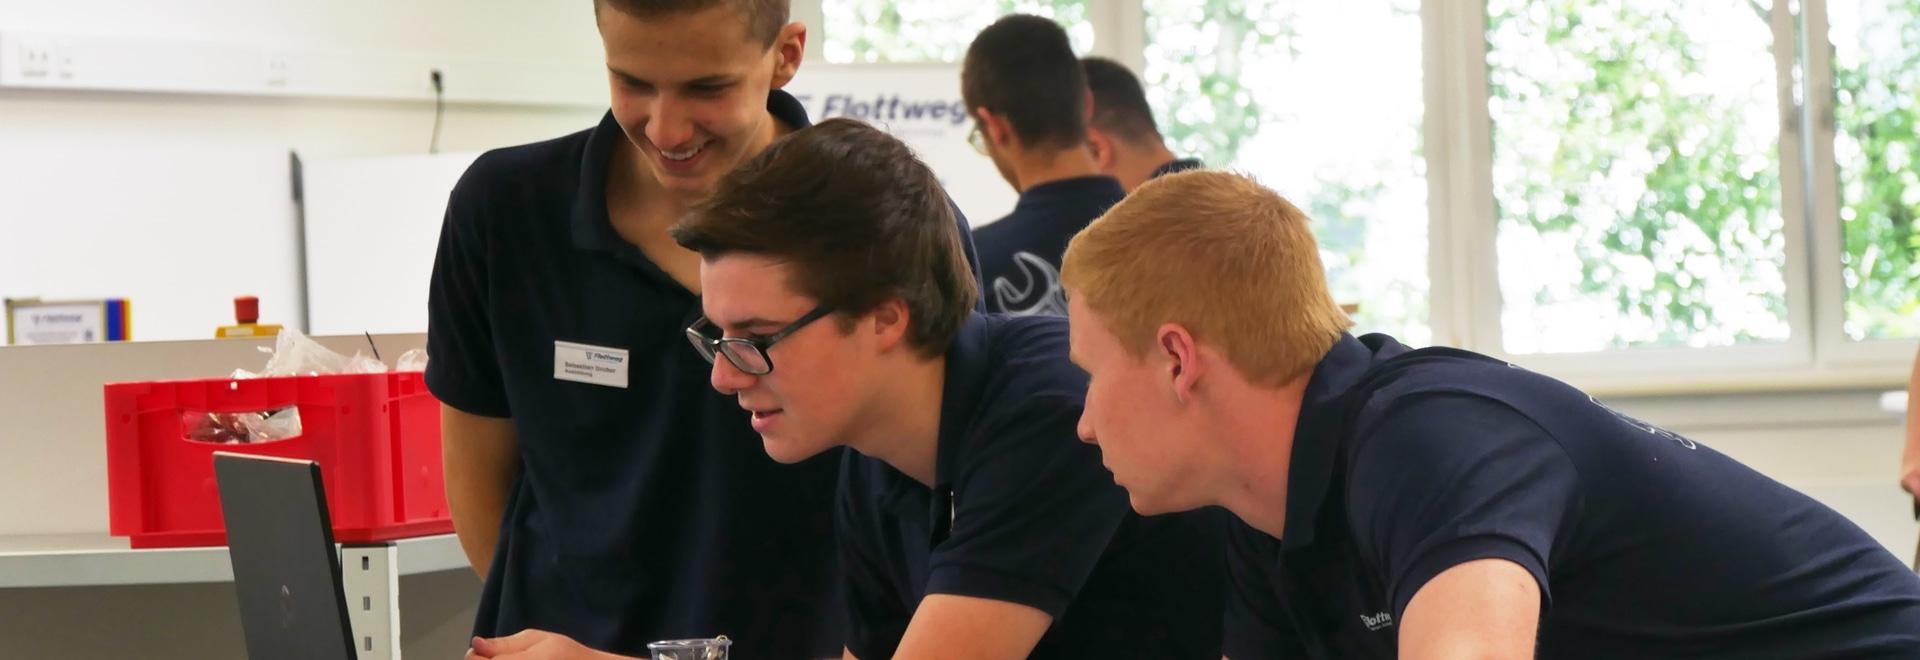 Open Apprenticeship Day – Momentum Towards the Future!